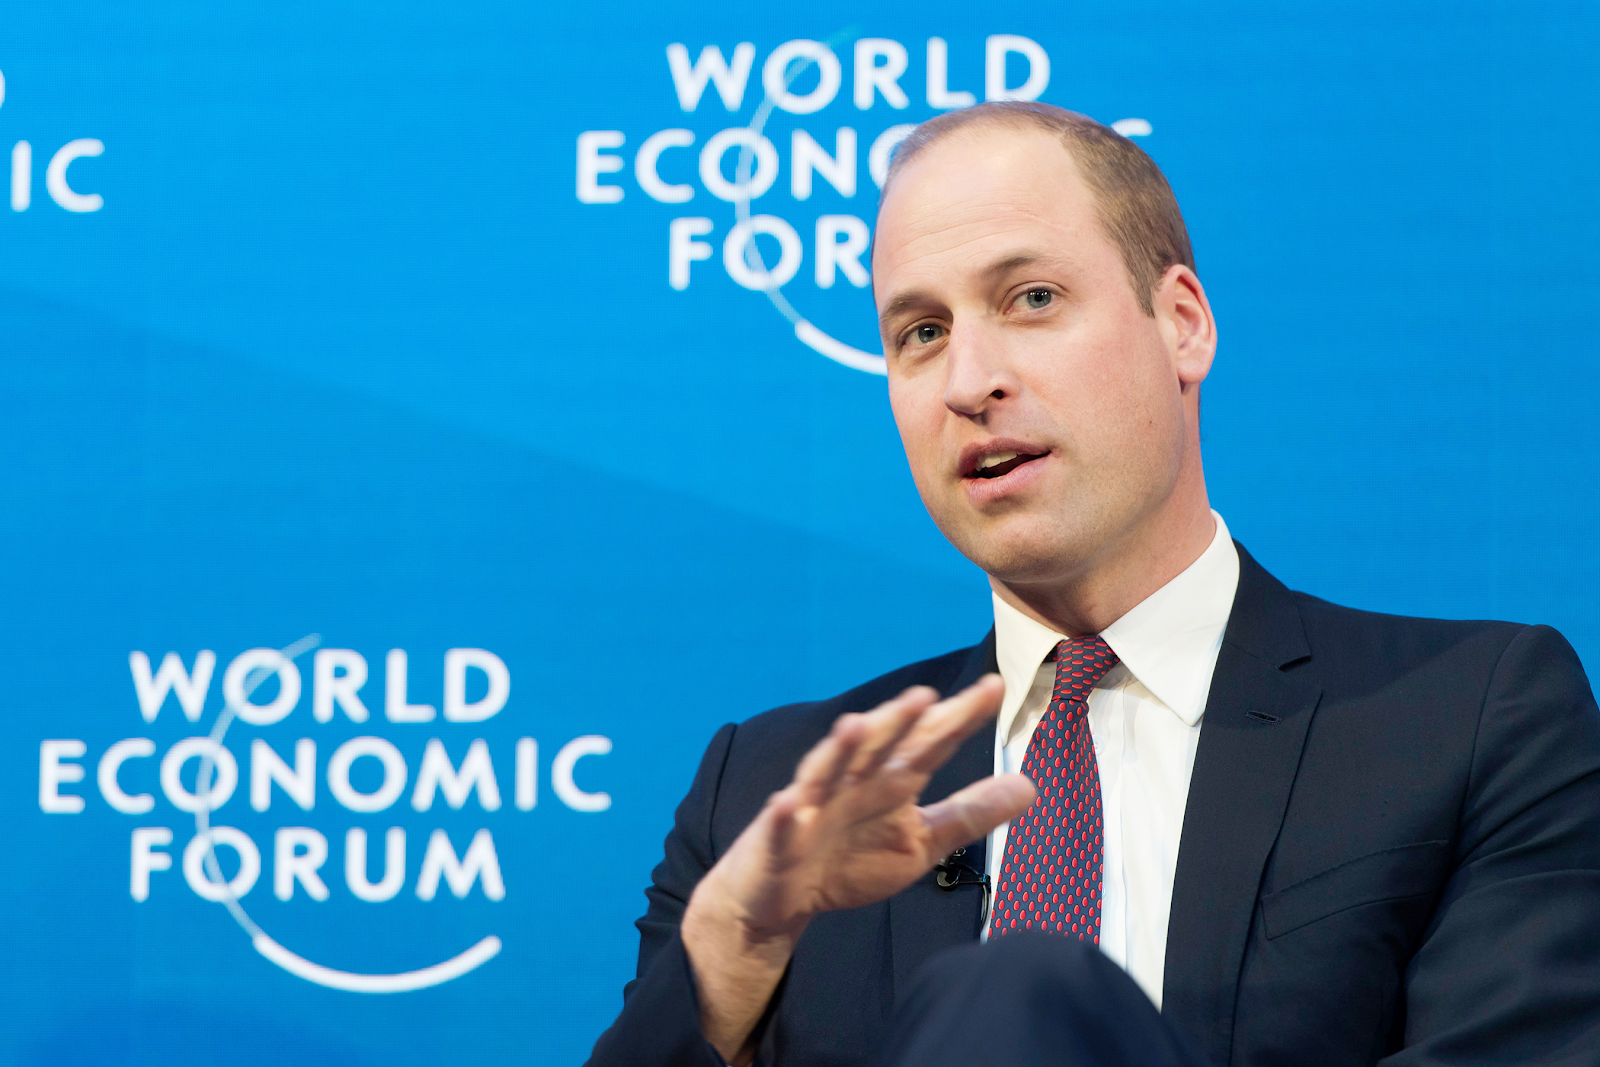 Prince William speaking at the World Economic Forum